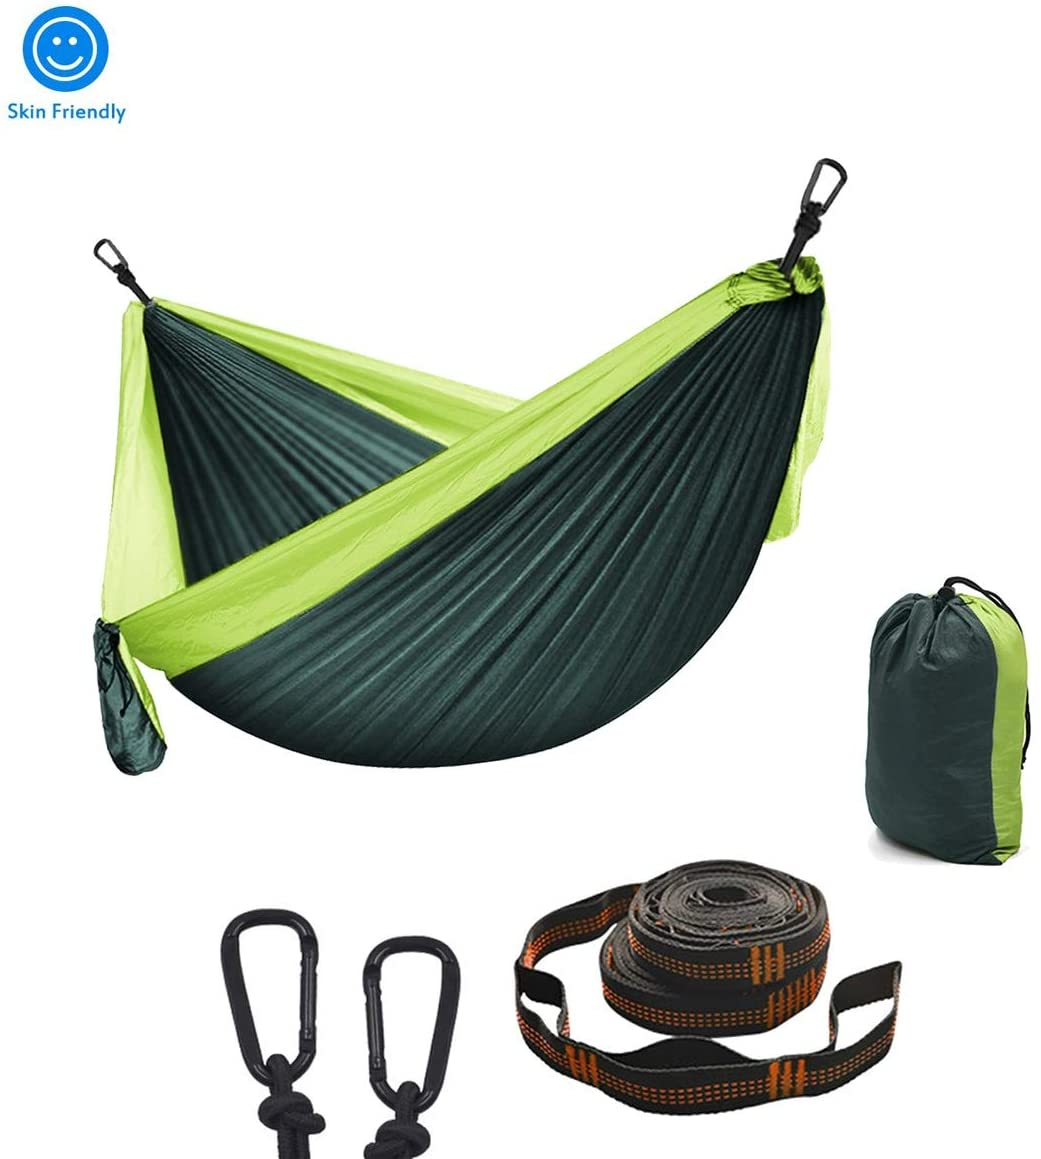 XXJF Camping Hammock Portable with 2 Tree Straps & Carabiners, Reinforced 450 Pound Capacity Single Portable Hammocks Parachute Fabric 210t Nylon for Travel Beach Yard Backyard Garden